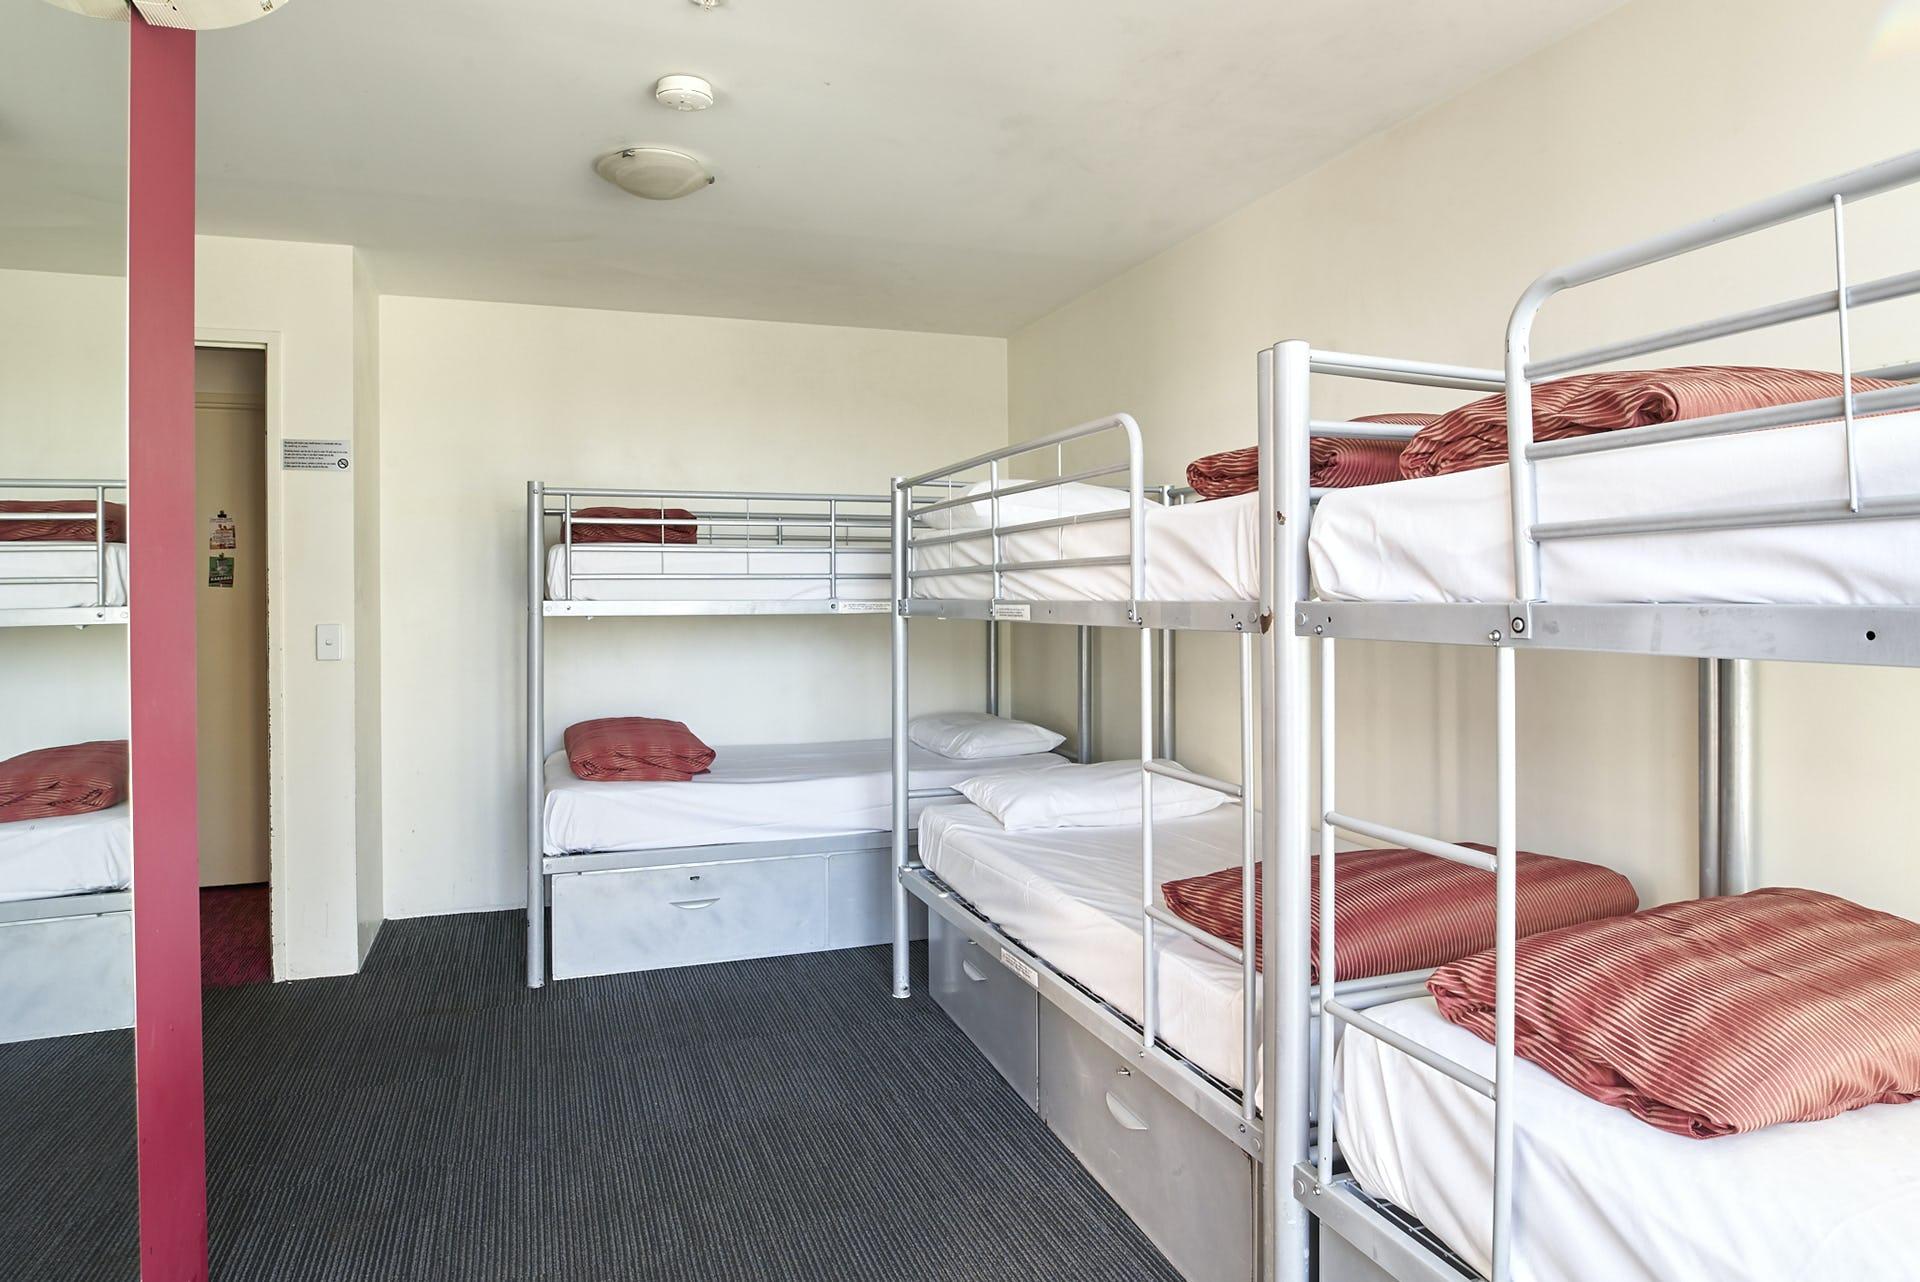 Base墨尔本背包客旅馆的8床套房